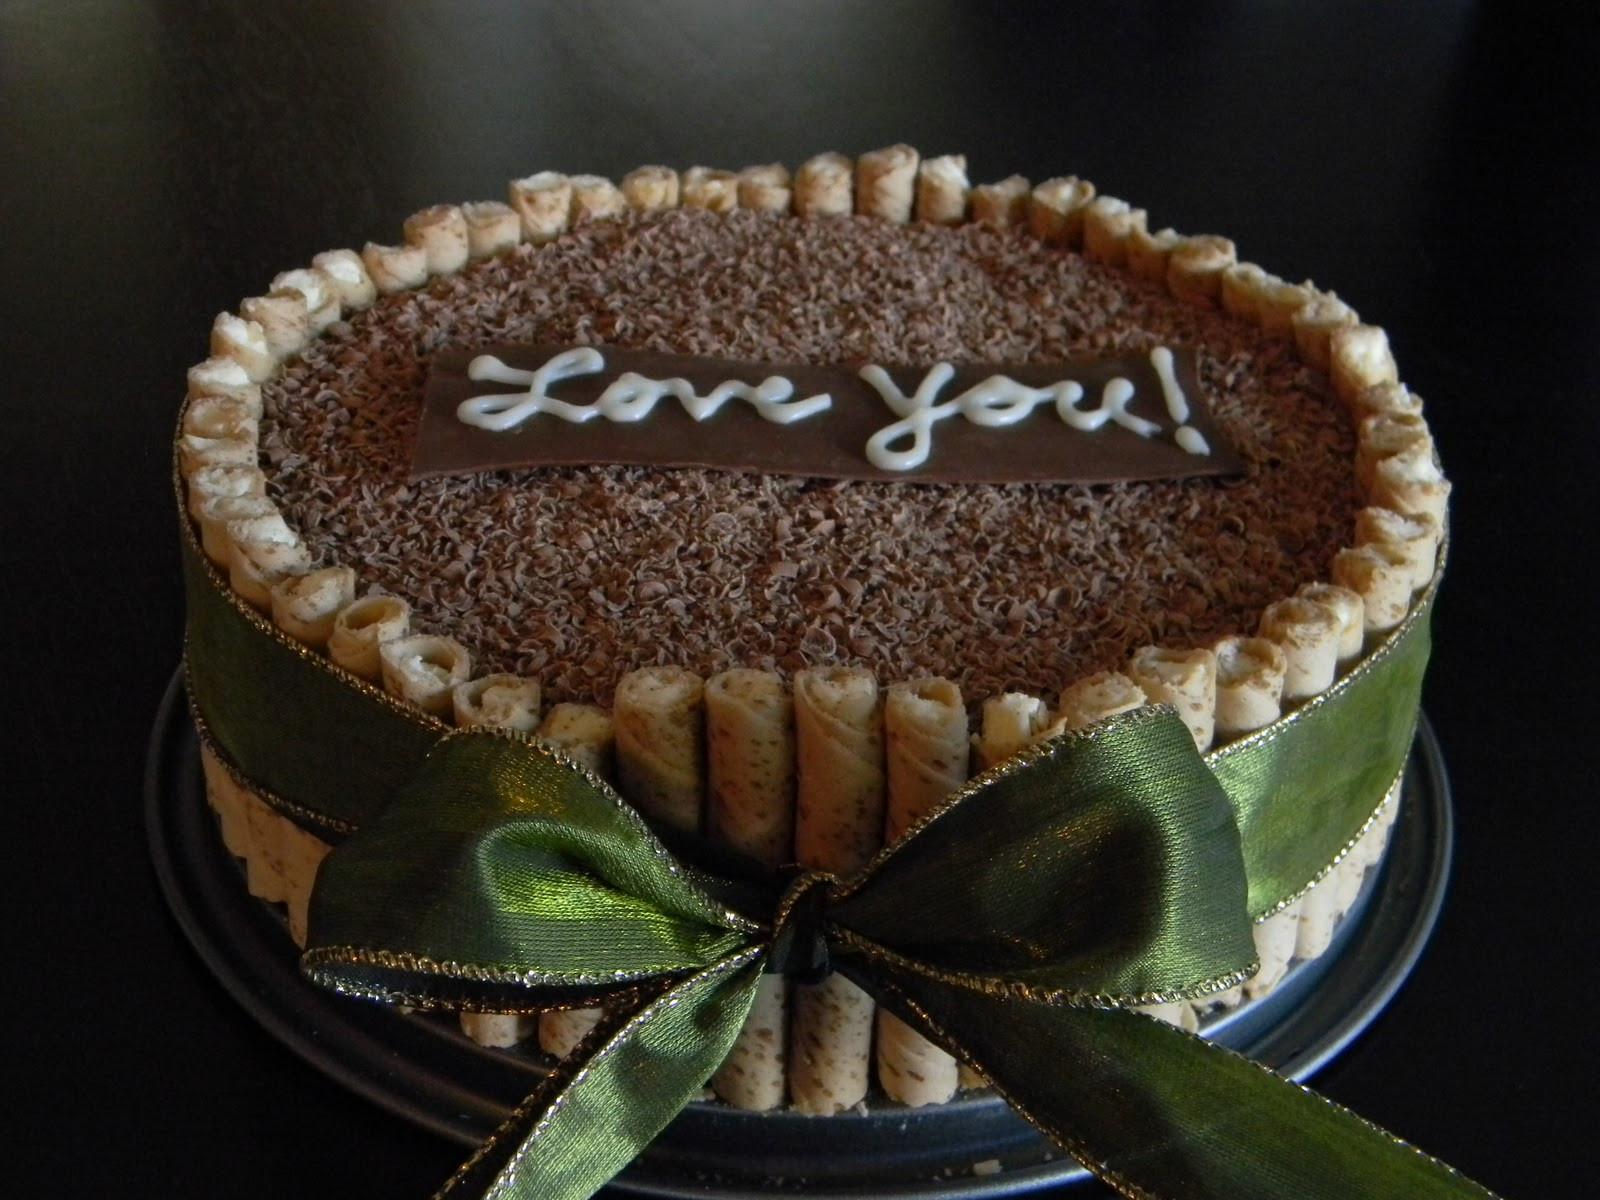 Best ideas about Tiramisu Birthday Cake . Save or Pin Tiramisu Birthday Cake Now.